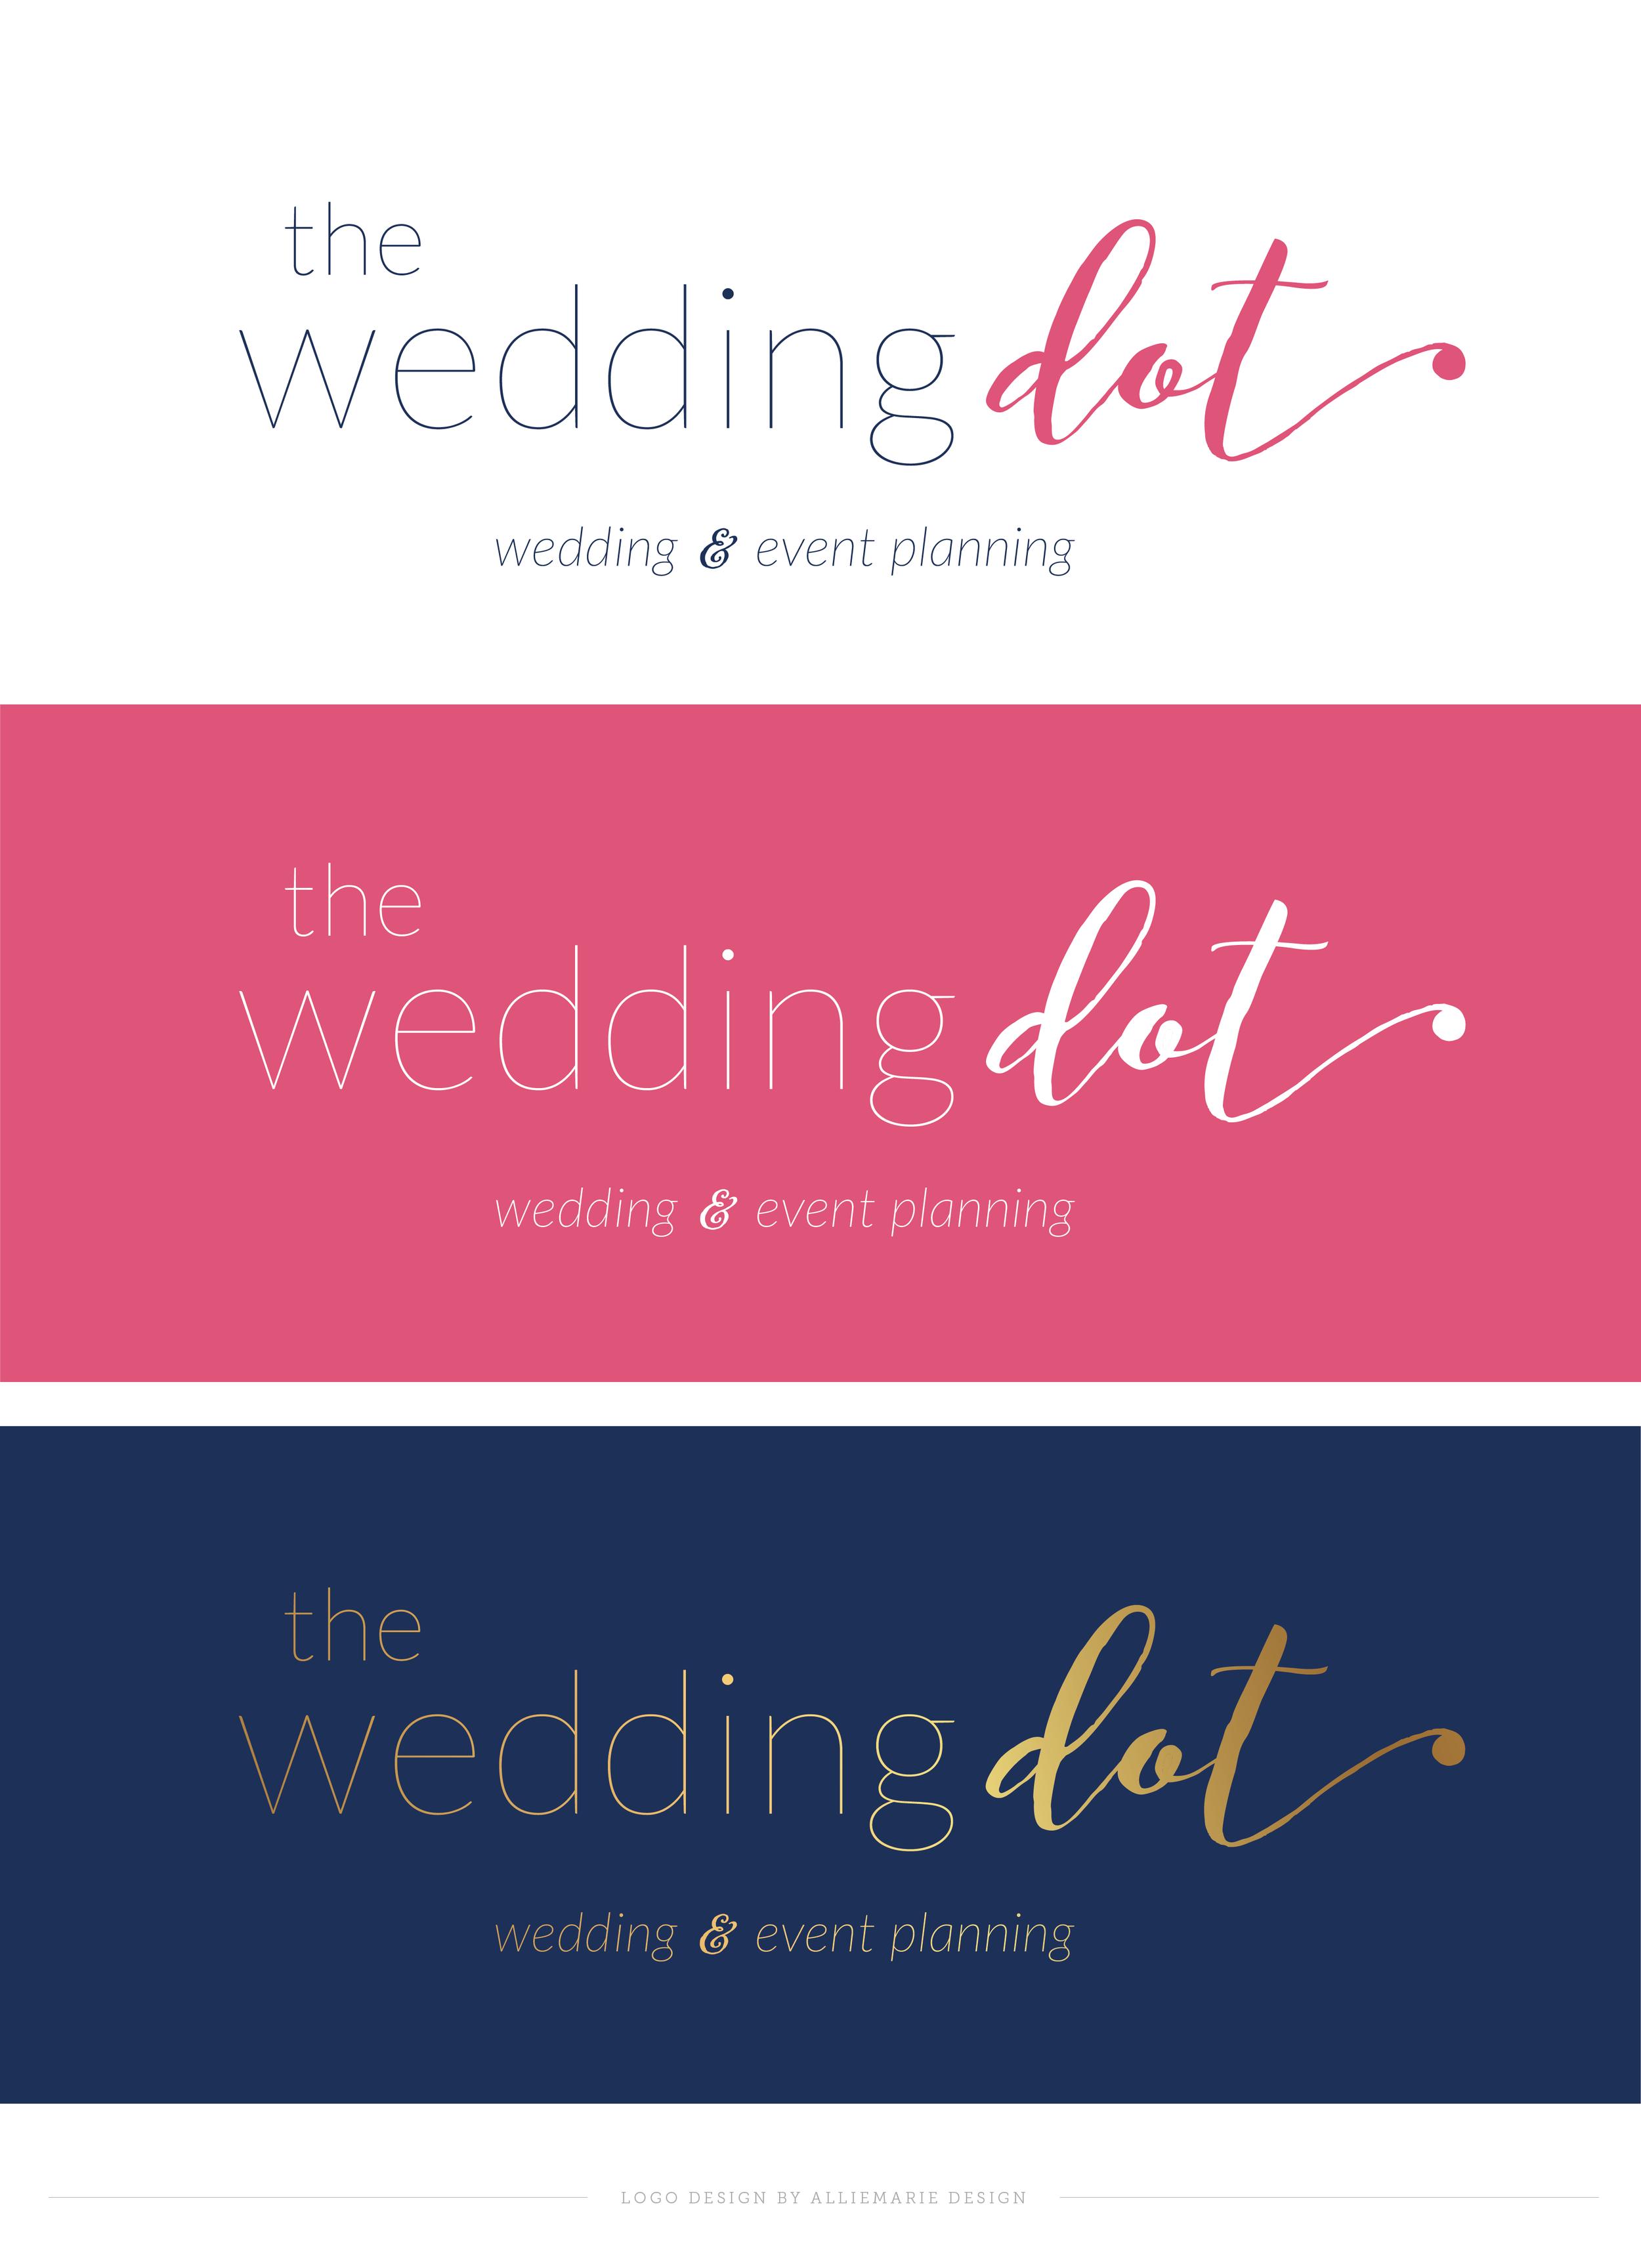 The Wedding Dot, Logo Design by AllieMarie Design